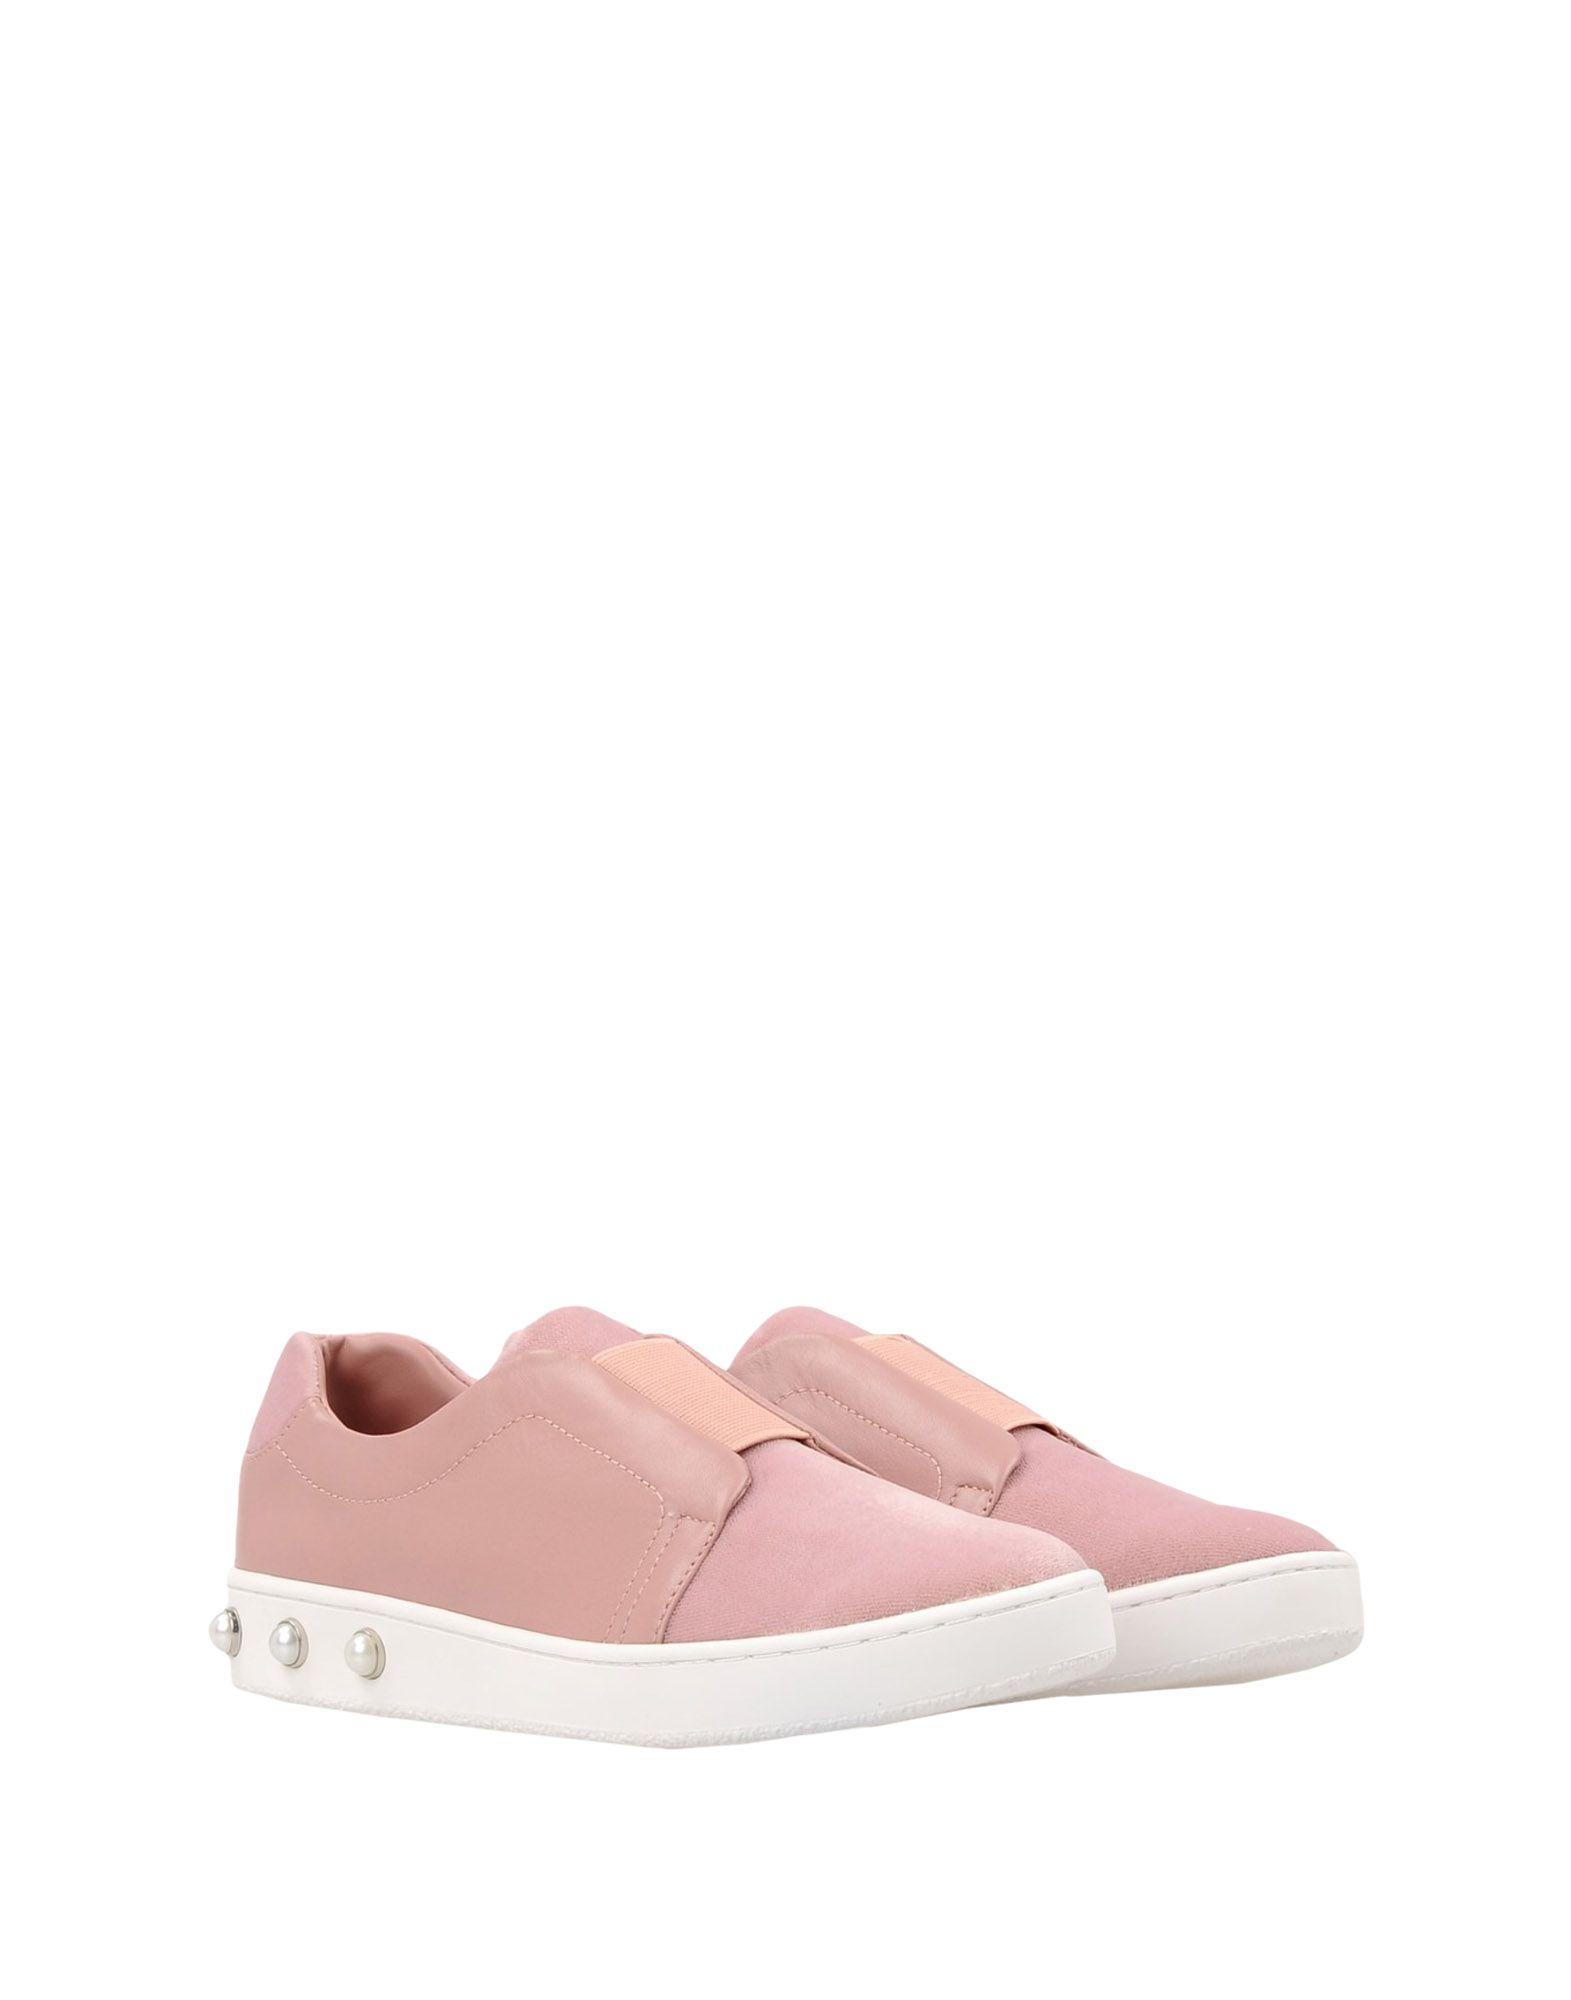 Stilvolle Stilvolle Stilvolle billige Schuhe Dkny Bobbi Hardware  11428573QU 47c8f3